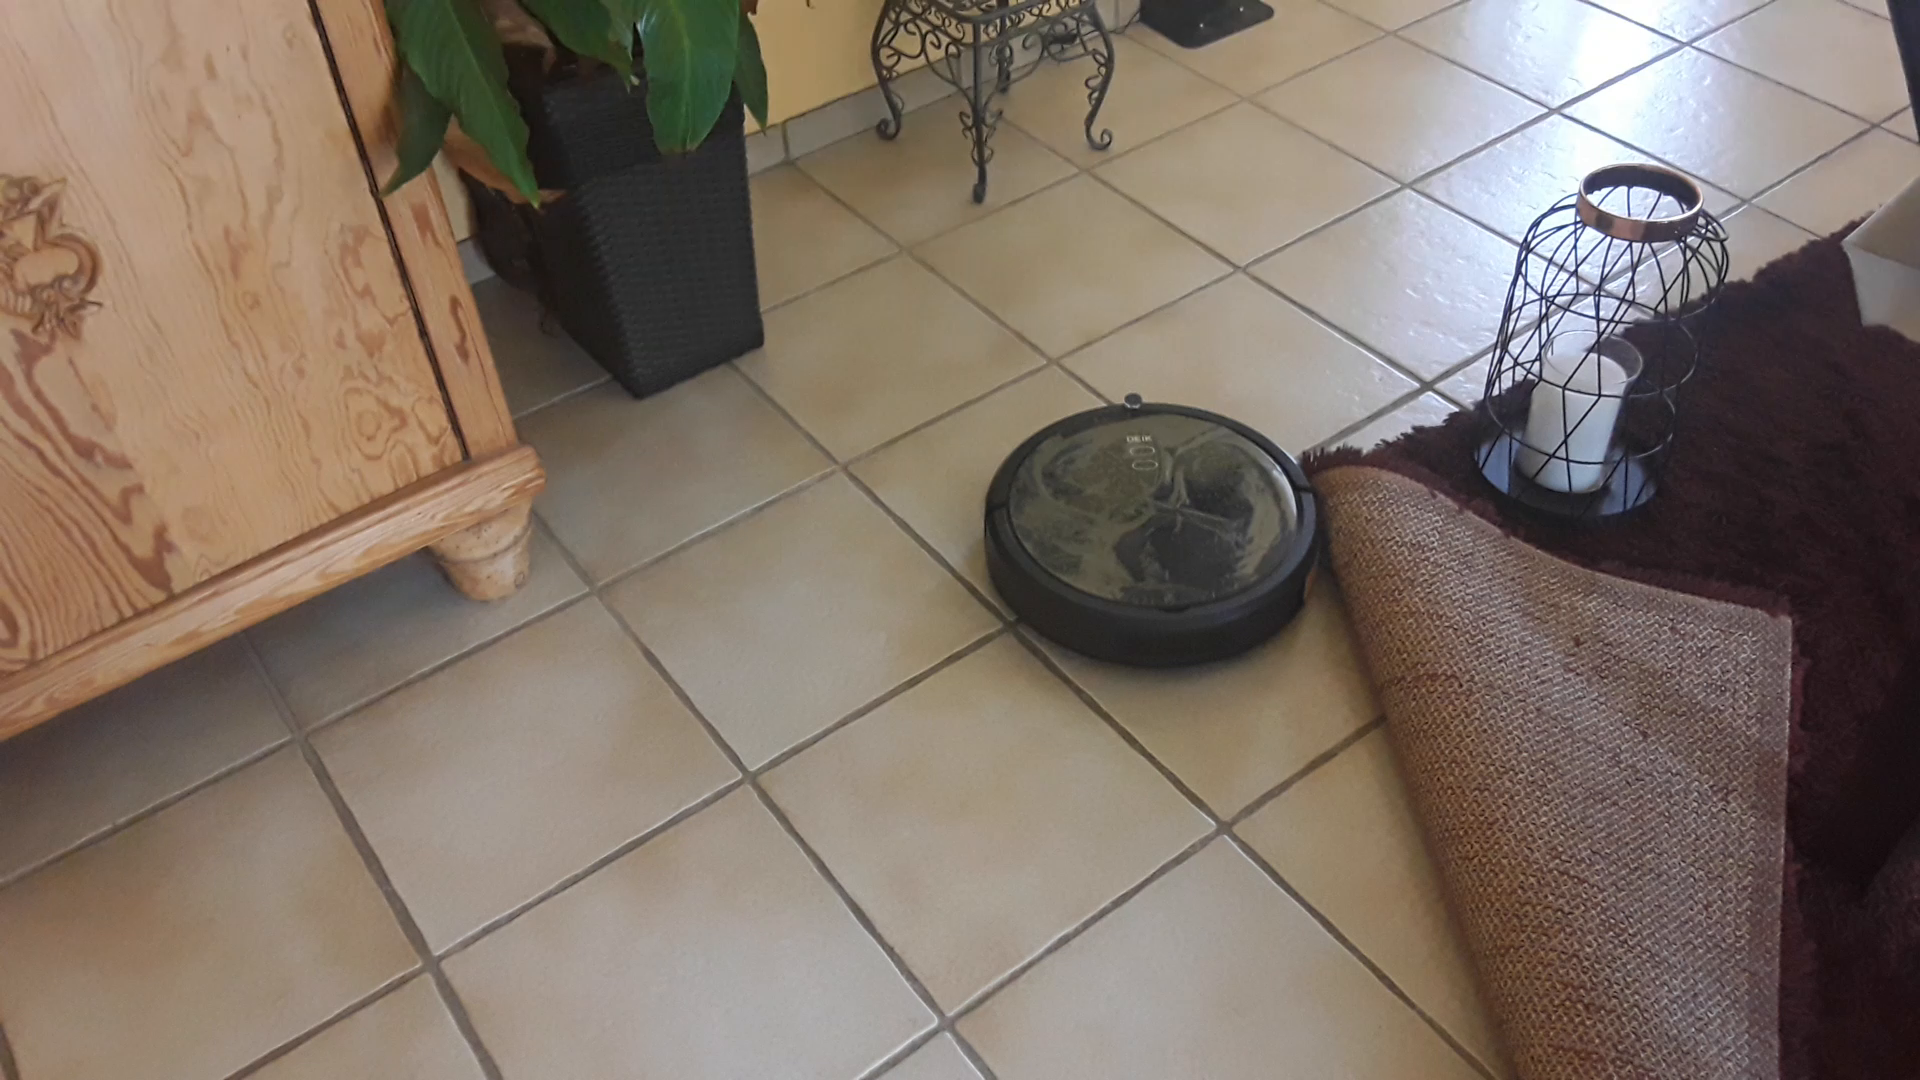 Quietschender Fußbodenbelag ~ Amazon.de:kundenrezensionen: deik saugroboter leistungsstarker